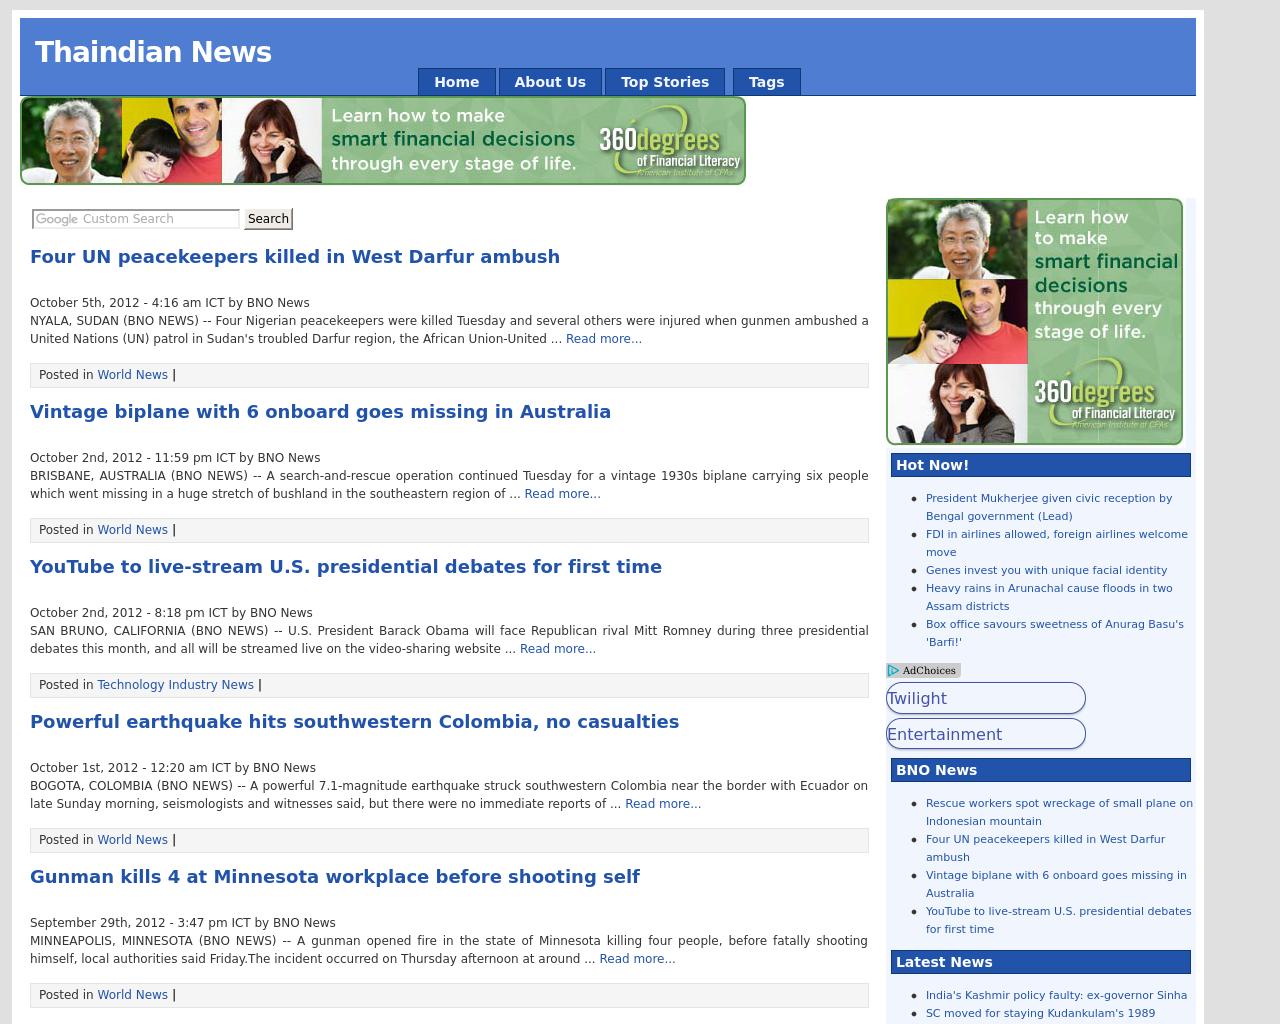 Thaindian-News-Advertising-Reviews-Pricing